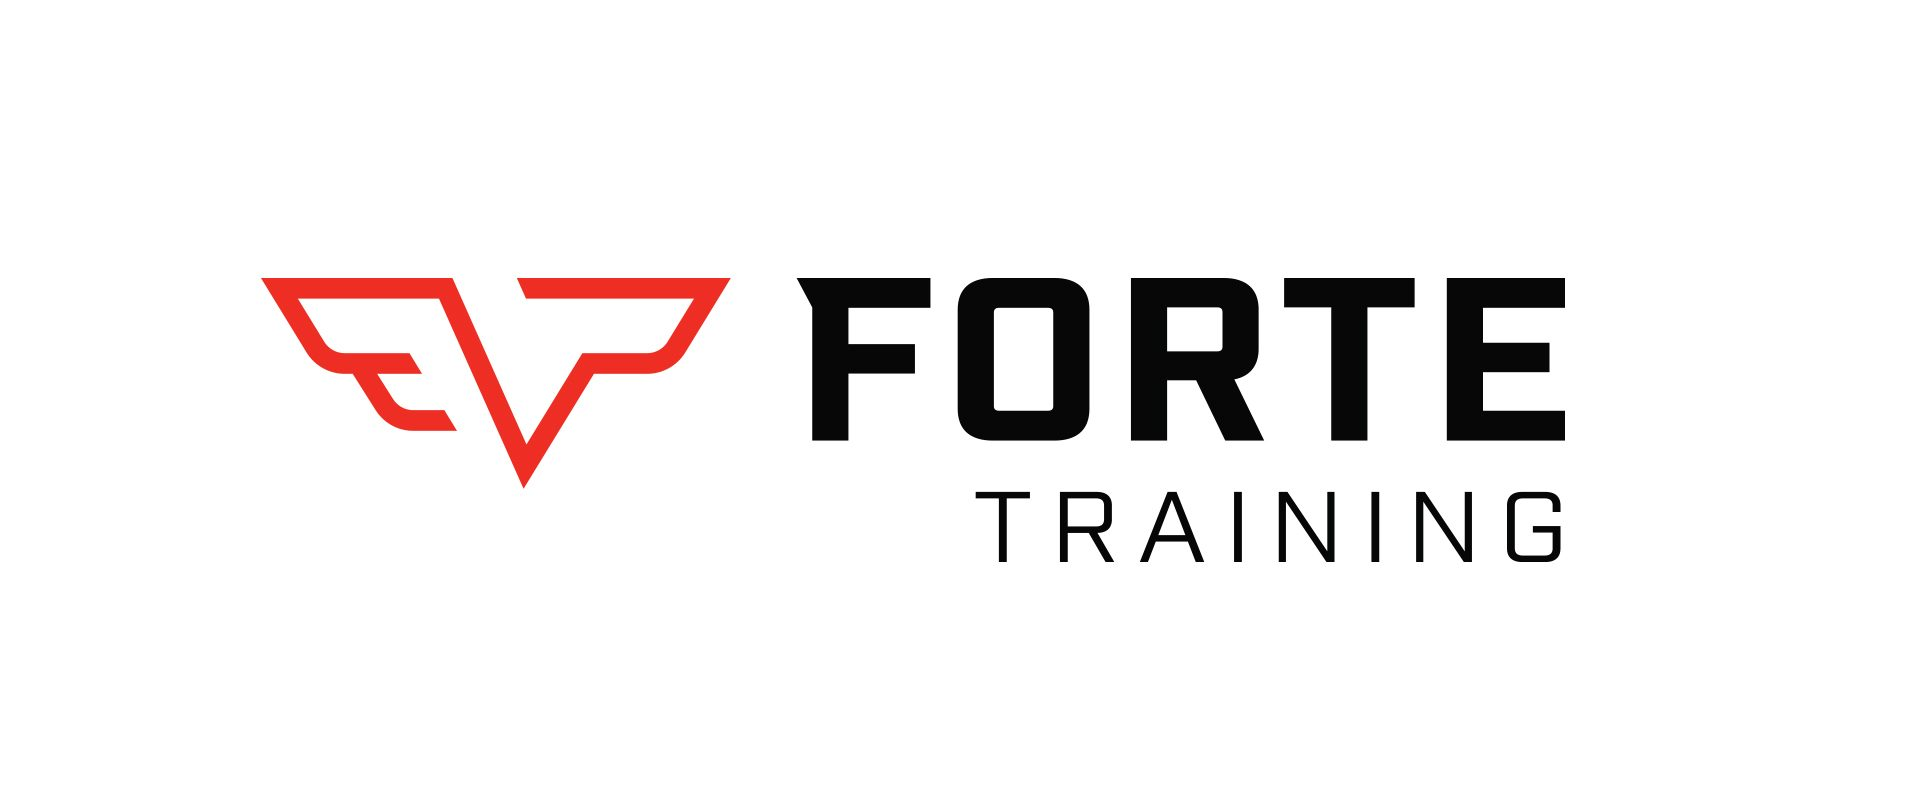 Y5 Creative Case Studies 2017 Logo Forte Training